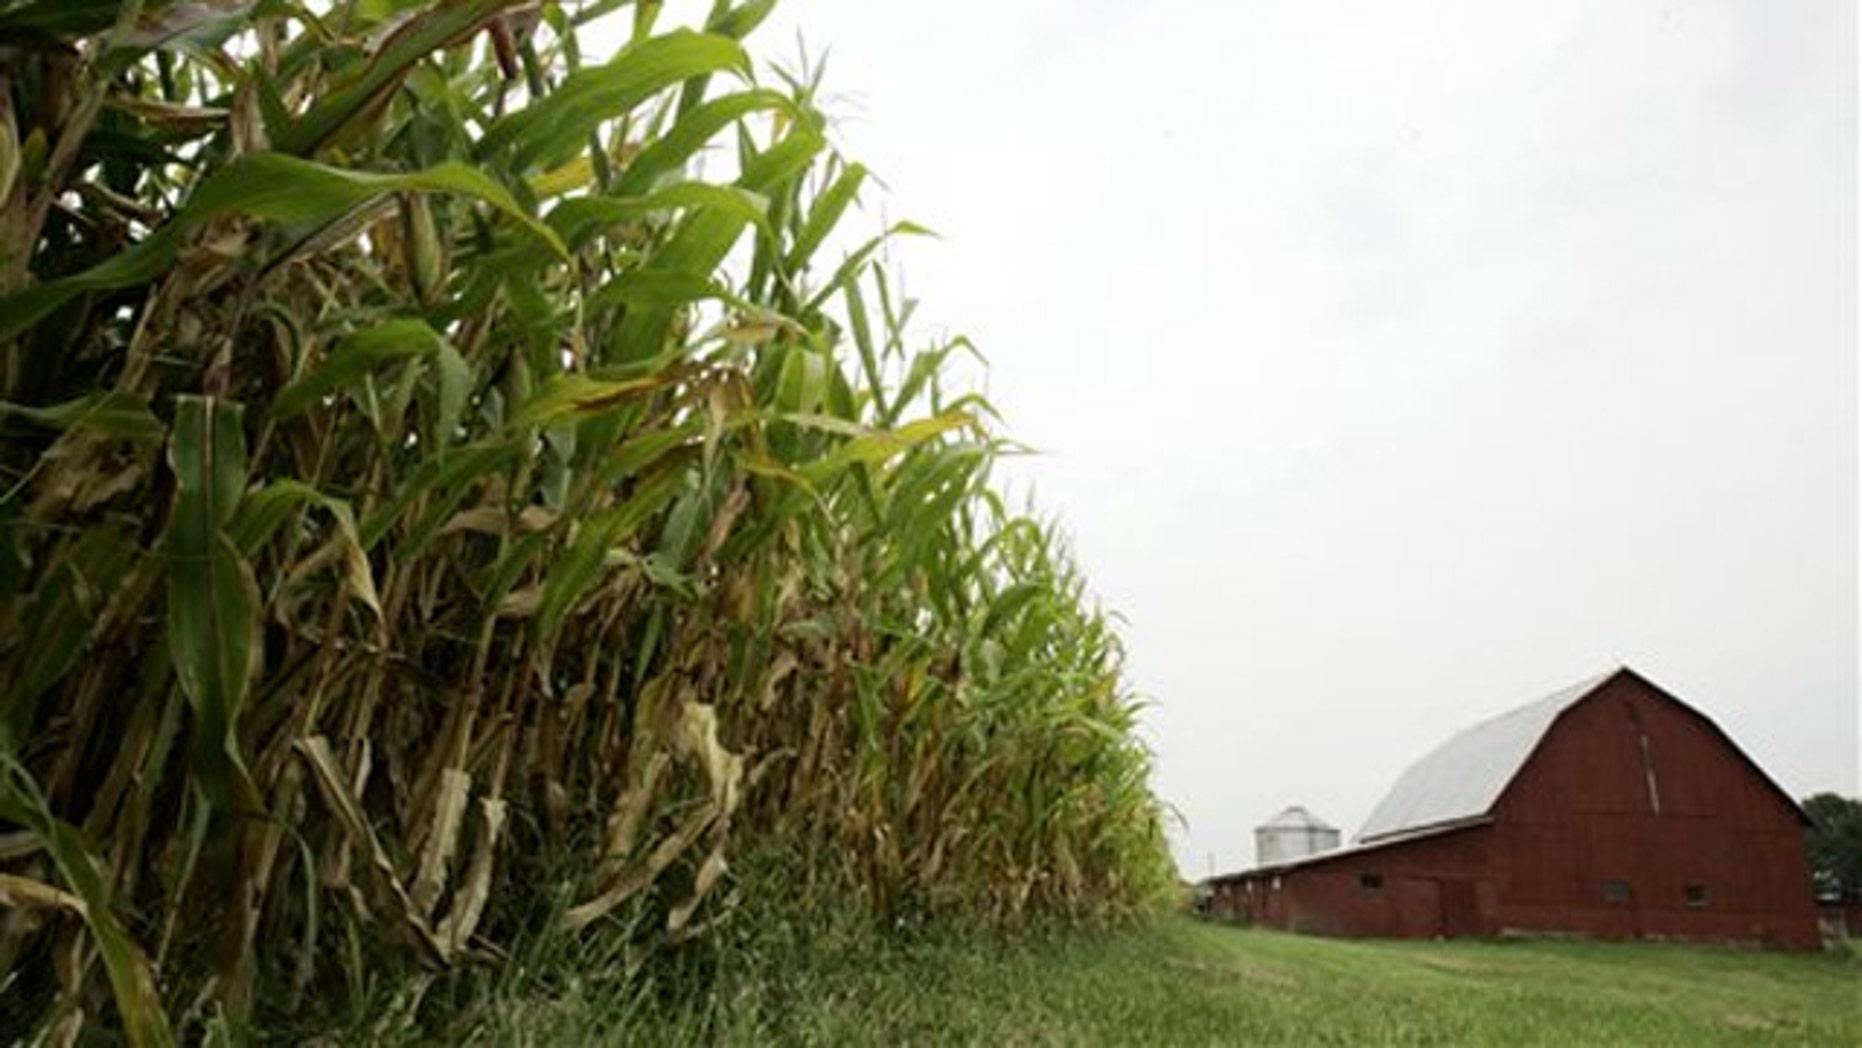 This 2006 file photo shows a farm near Morrow, Ohio. (AP Photo)